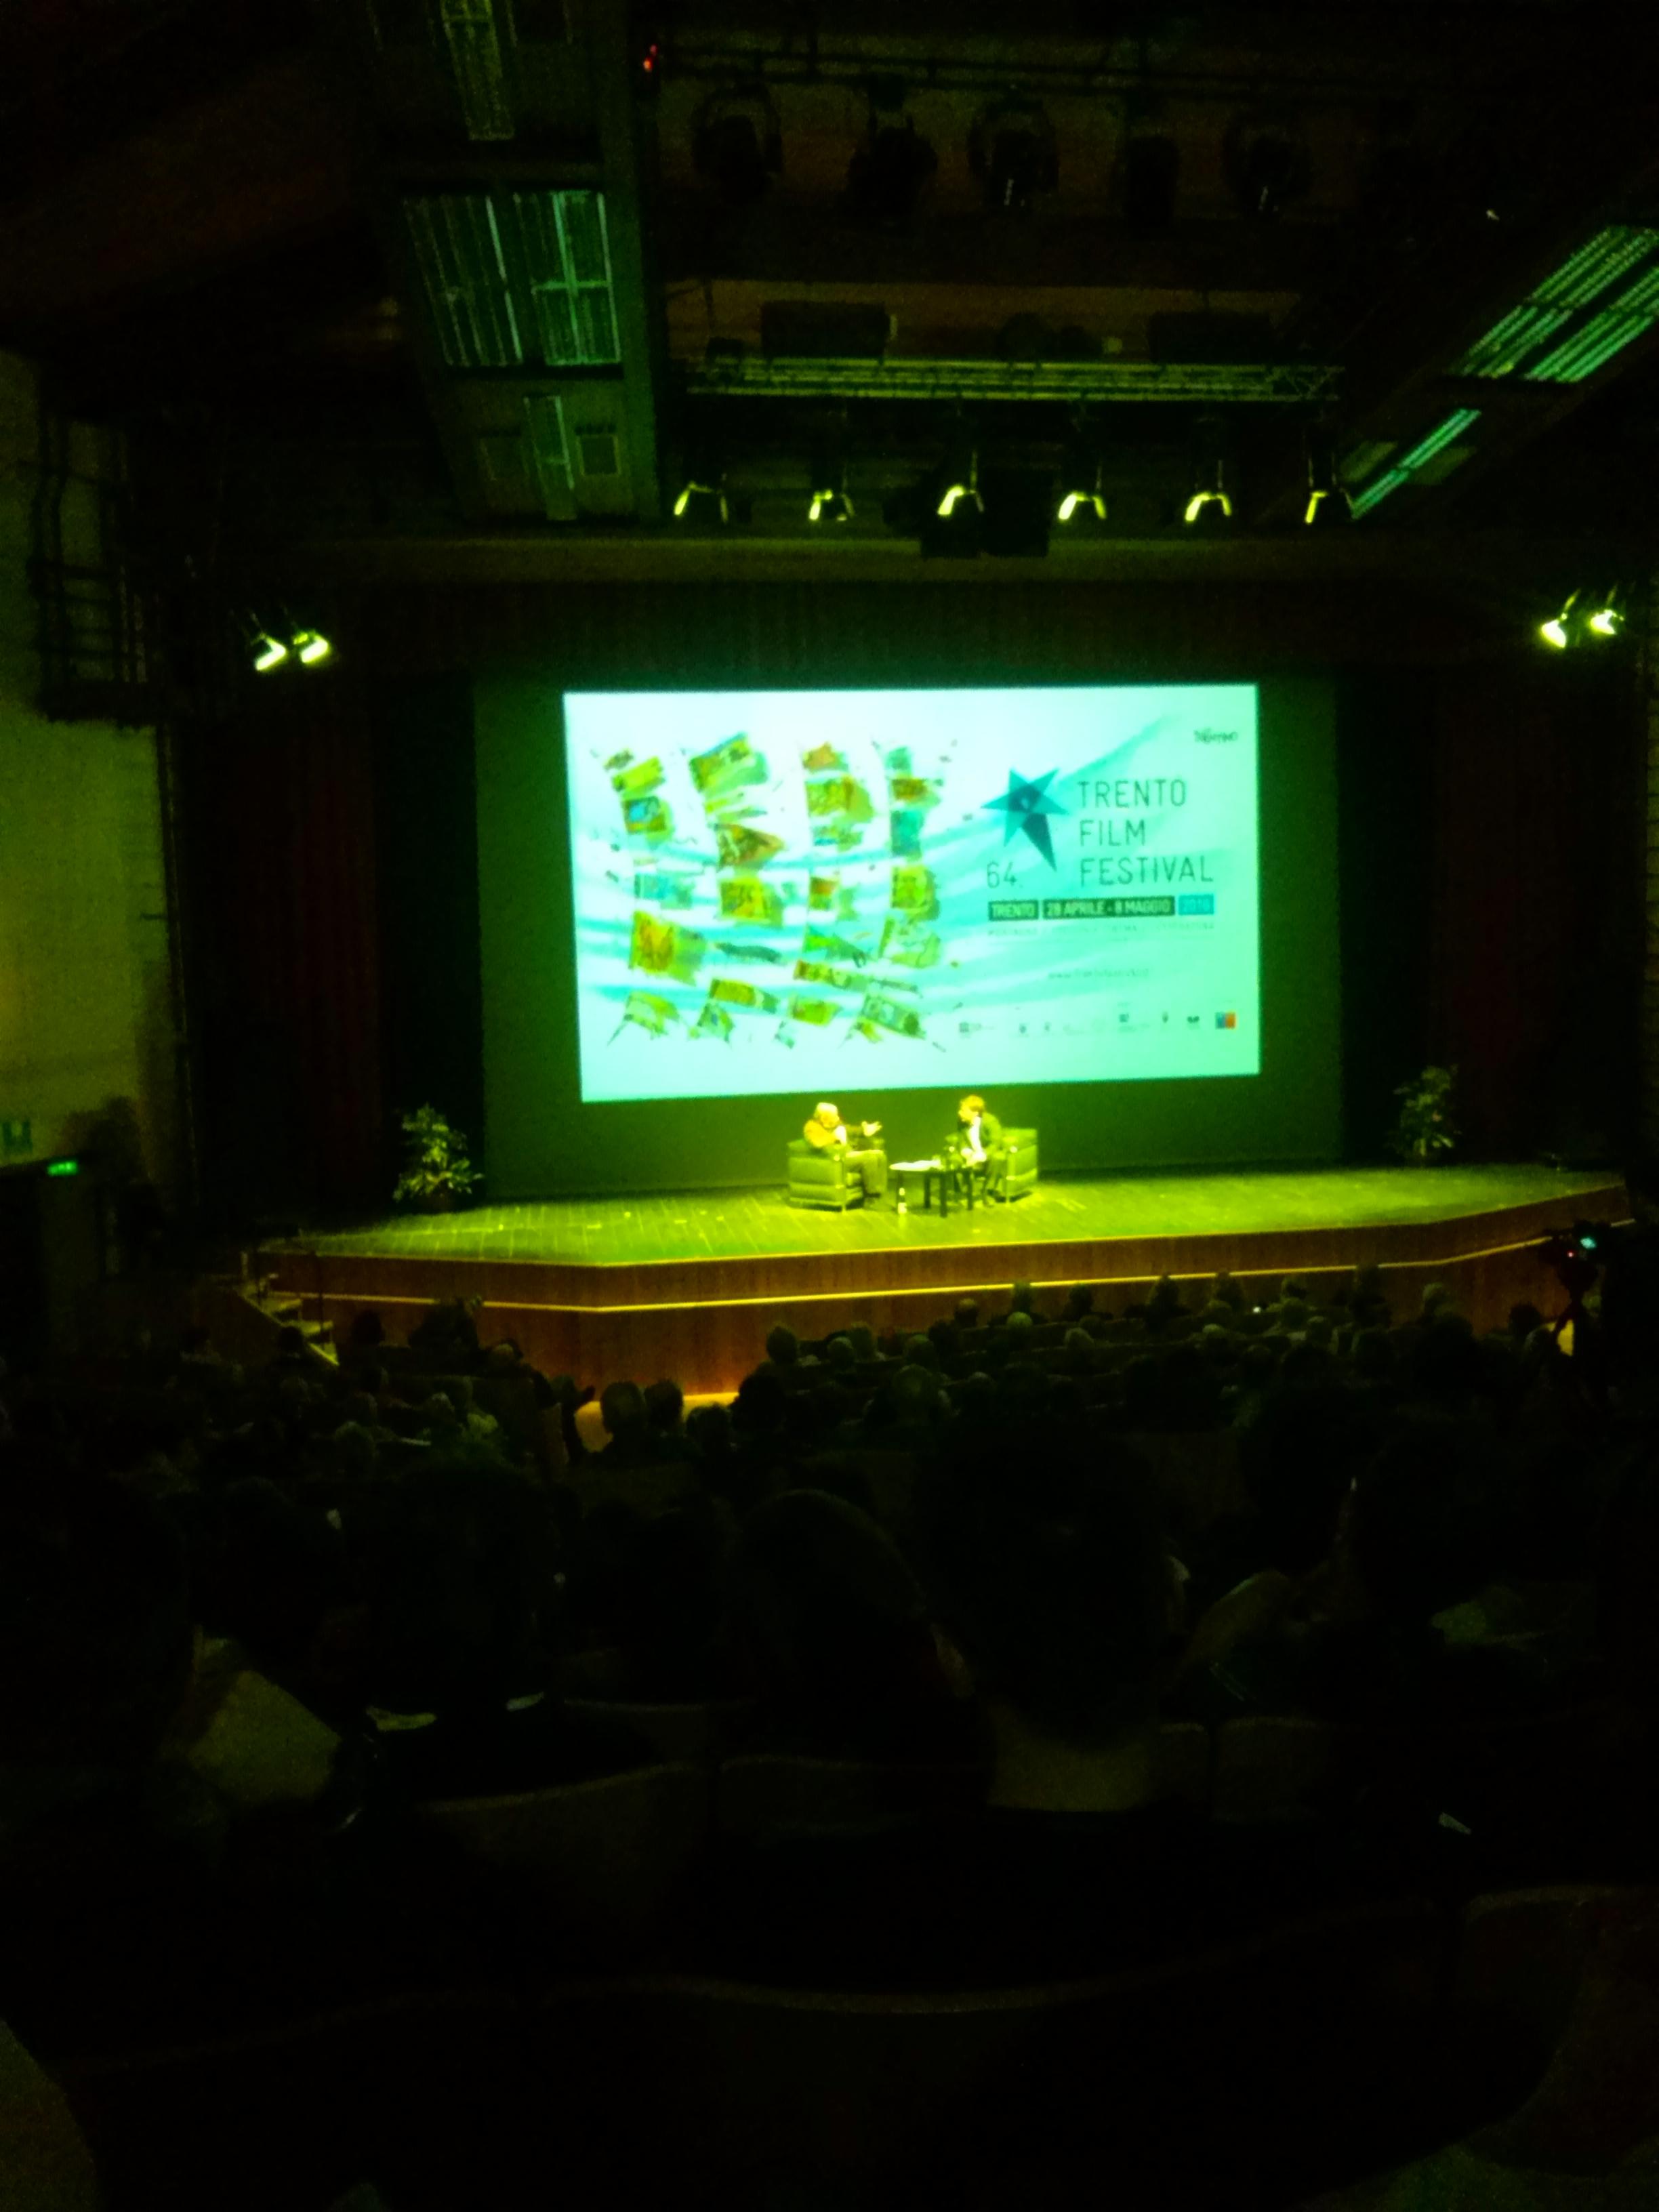 Luca Mercalli e don Luigi Ciotti al Trento Film Festival